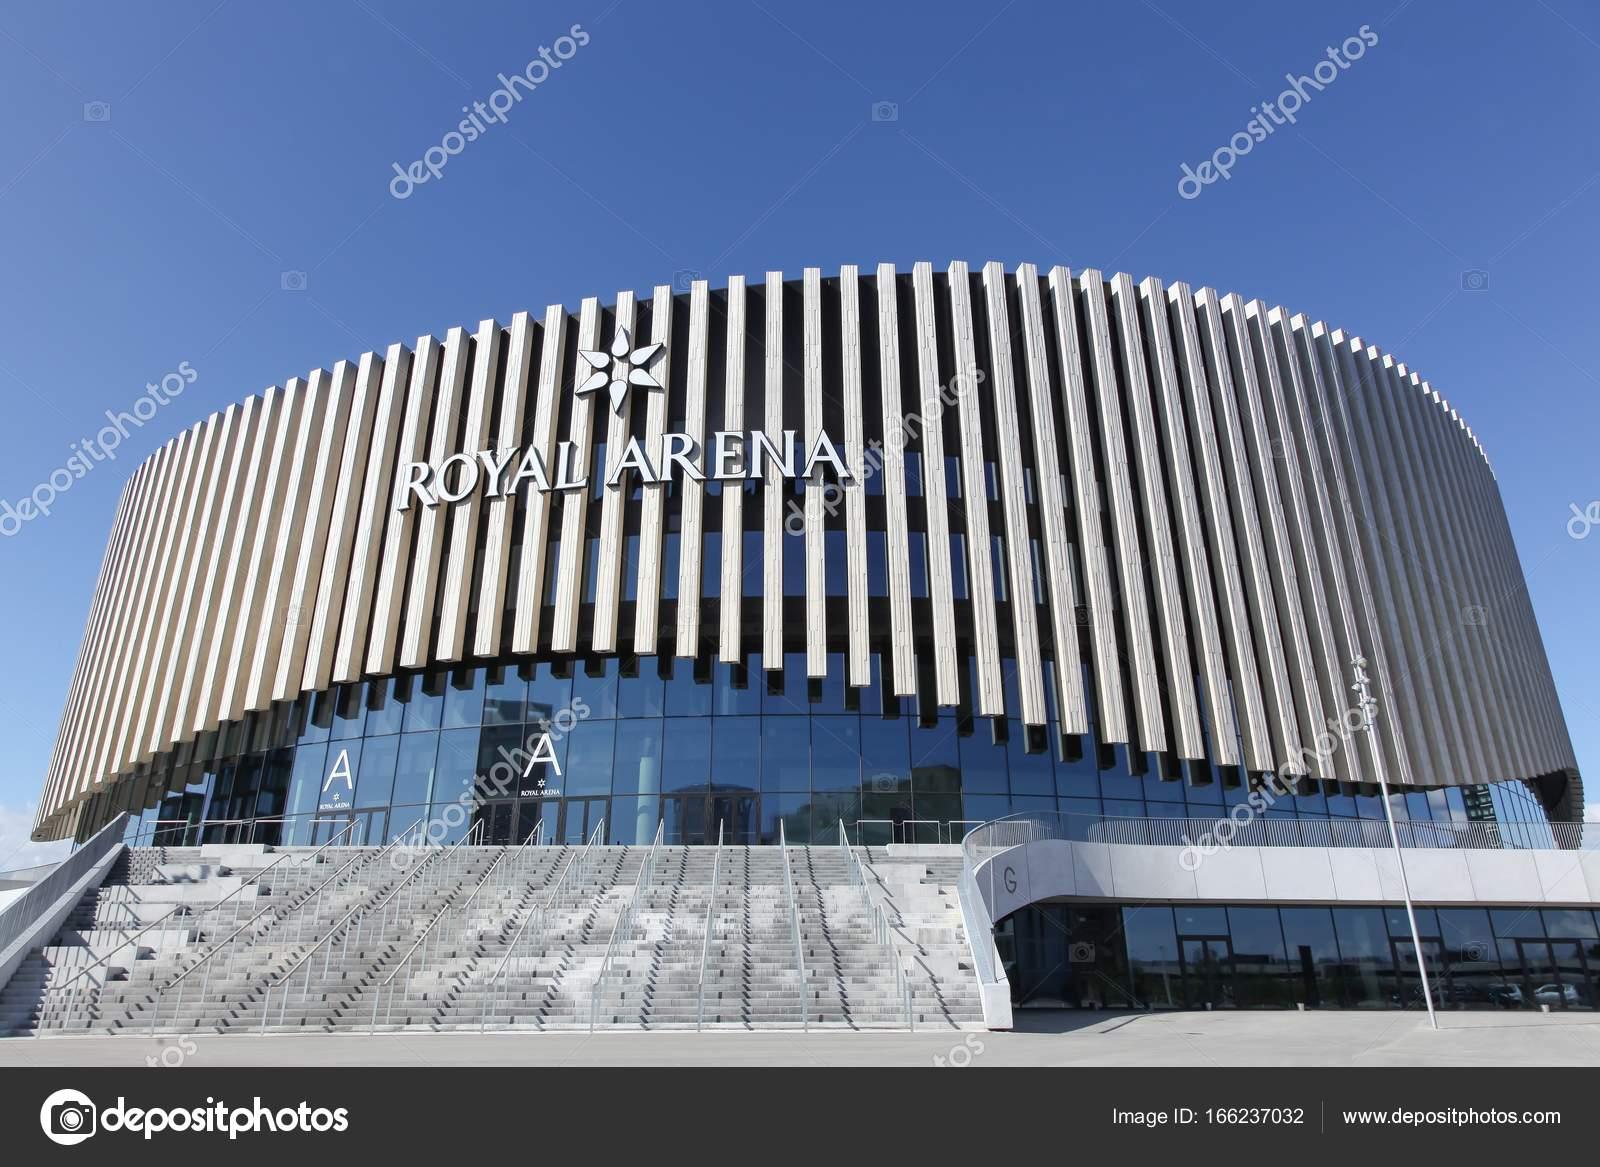 the royal arena in copenhagen denmark stock editorial